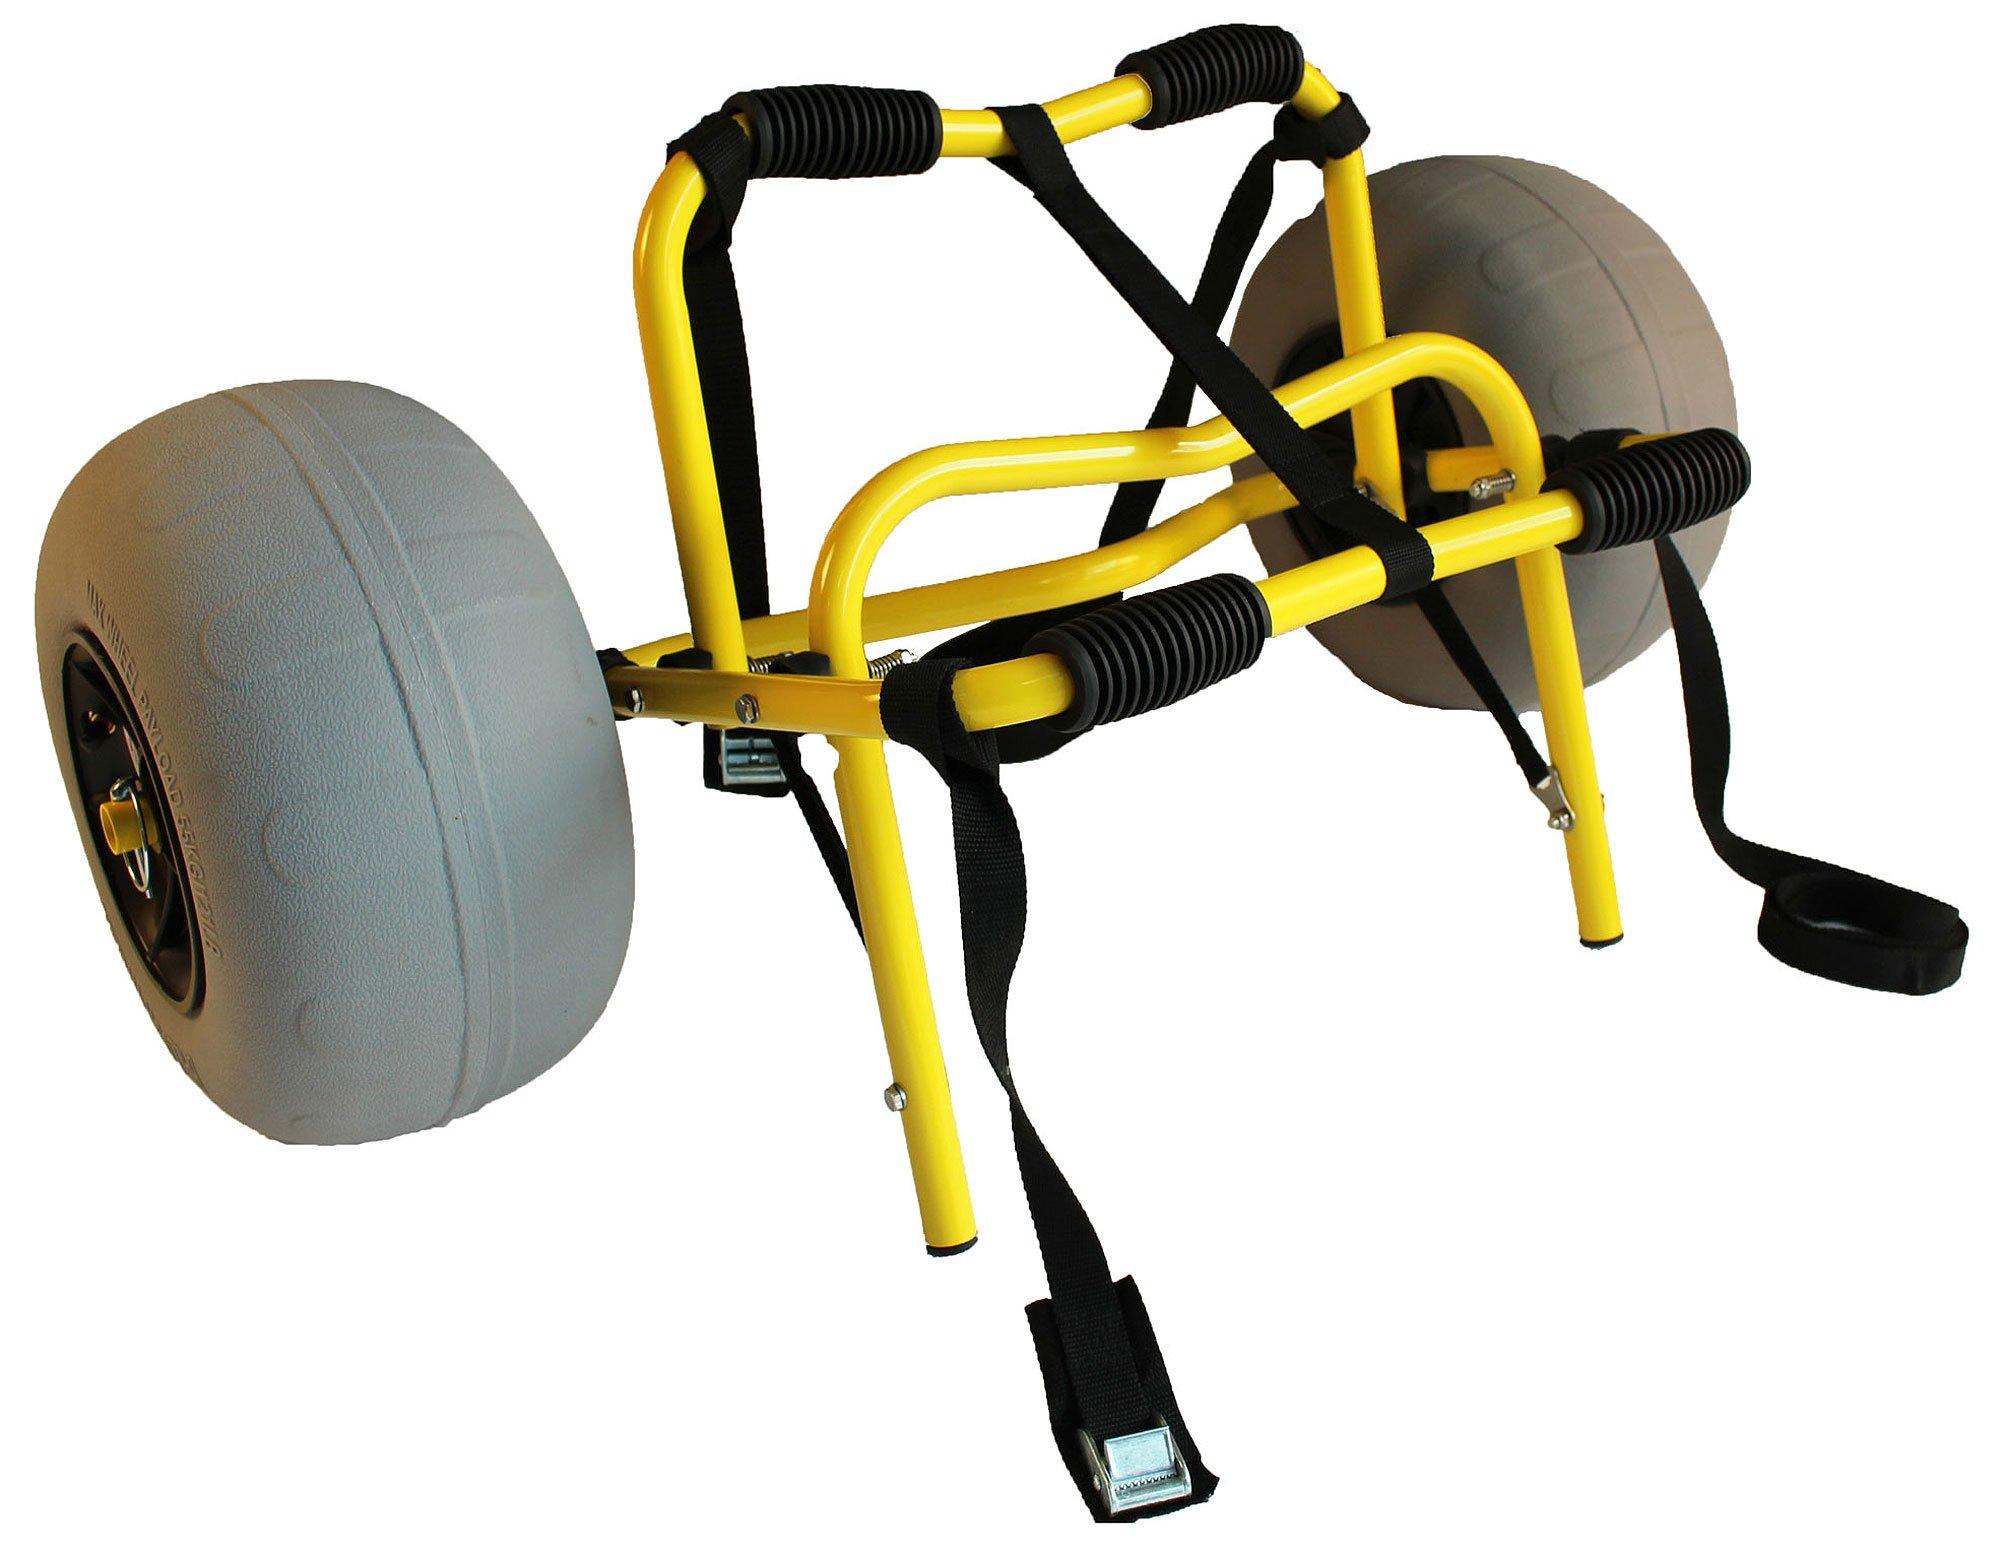 Suspenz Deluxe Balloon Sand Kayak Cart